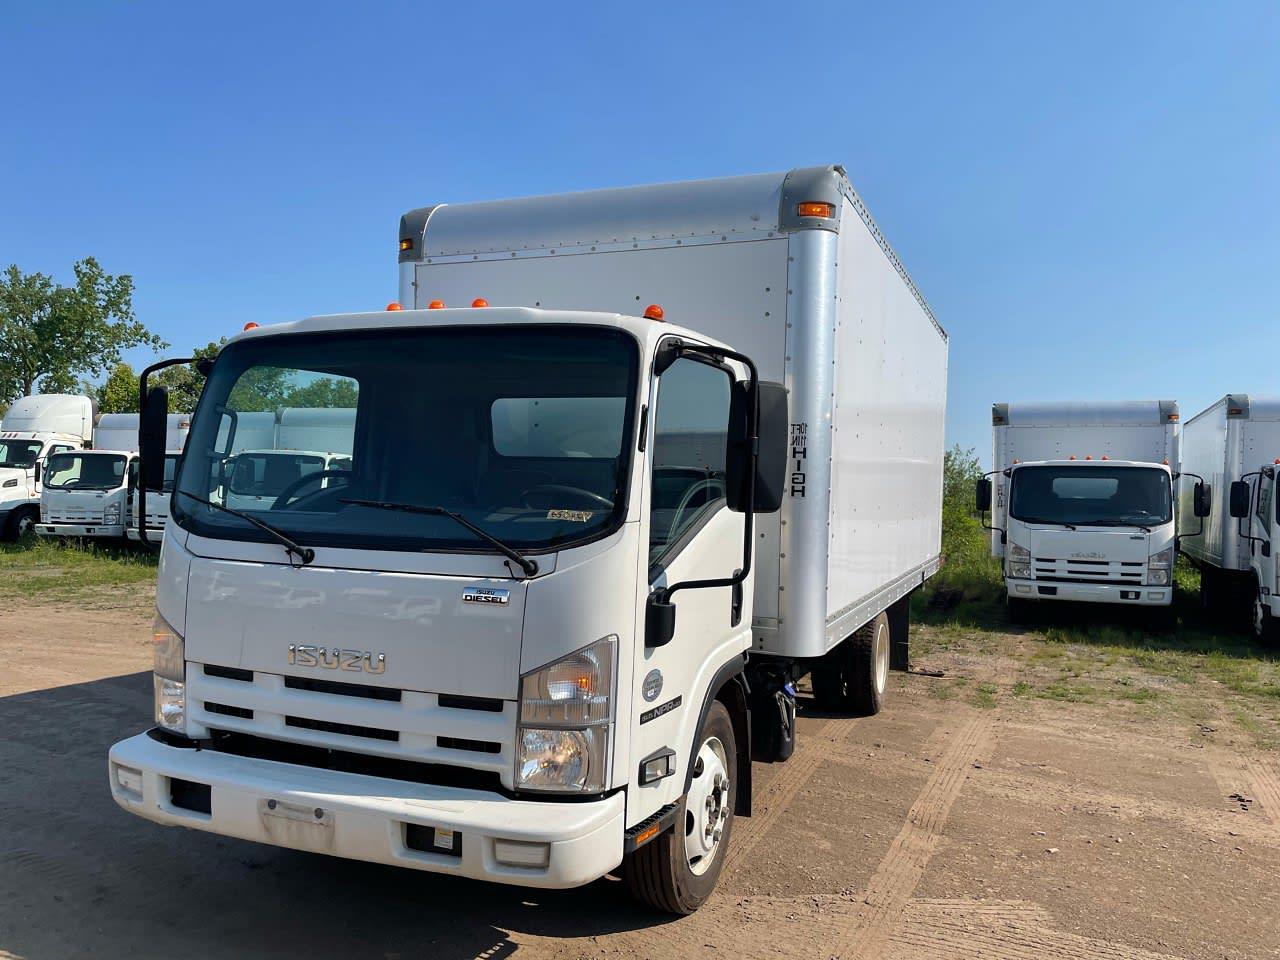 2015 Isuzu NQR Regular Cab 4x2, Dry Freight #650481 - photo 1